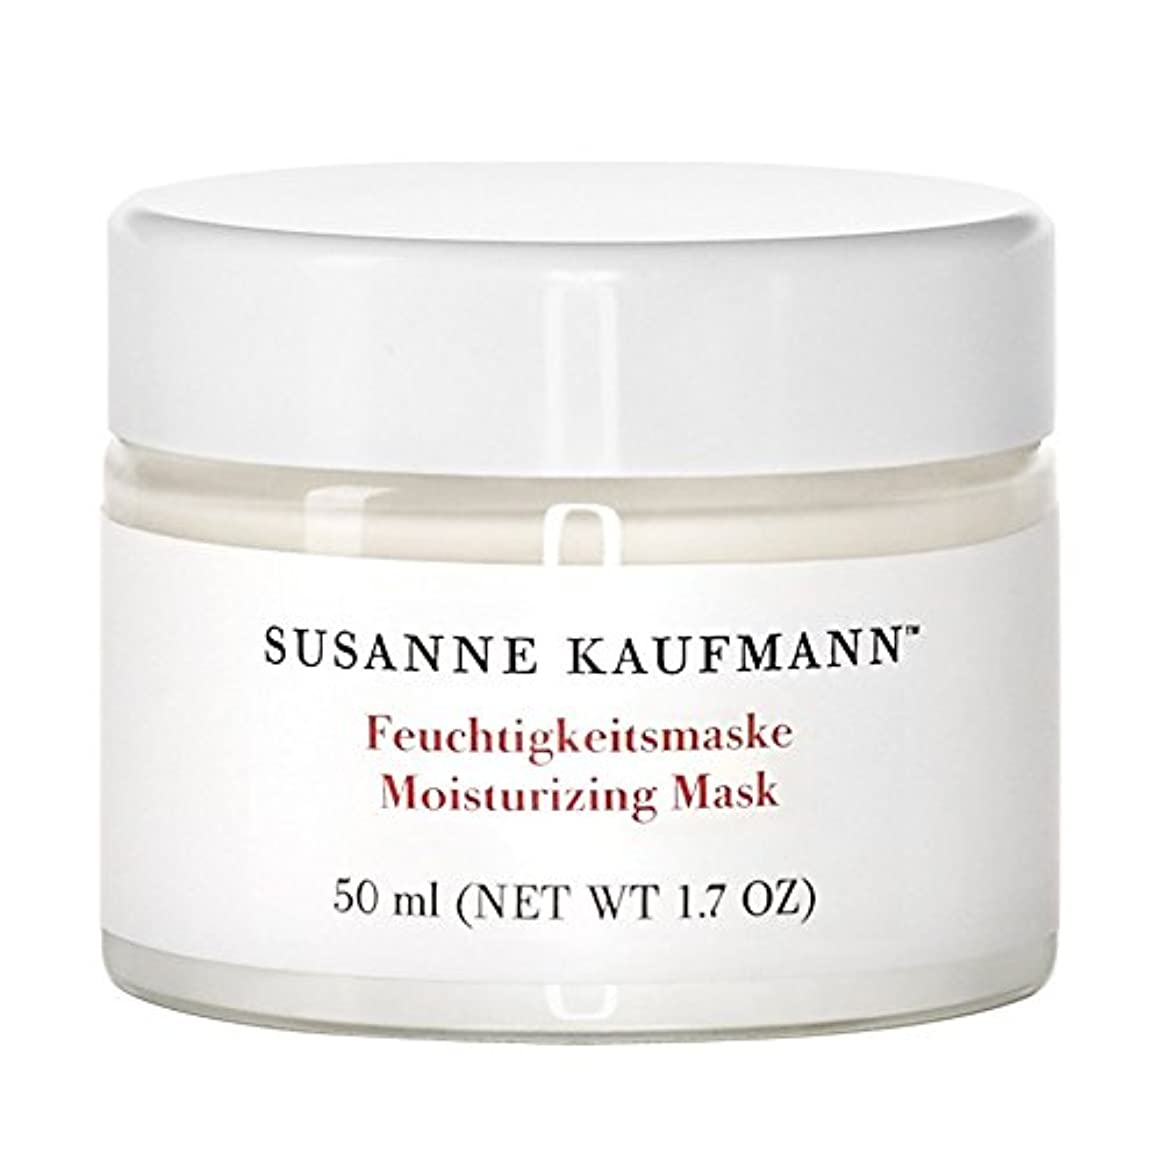 Susanne Kaufmann Moisturising Mask 50ml - スザンヌカウフマン保湿マスク50ミリリットル [並行輸入品]